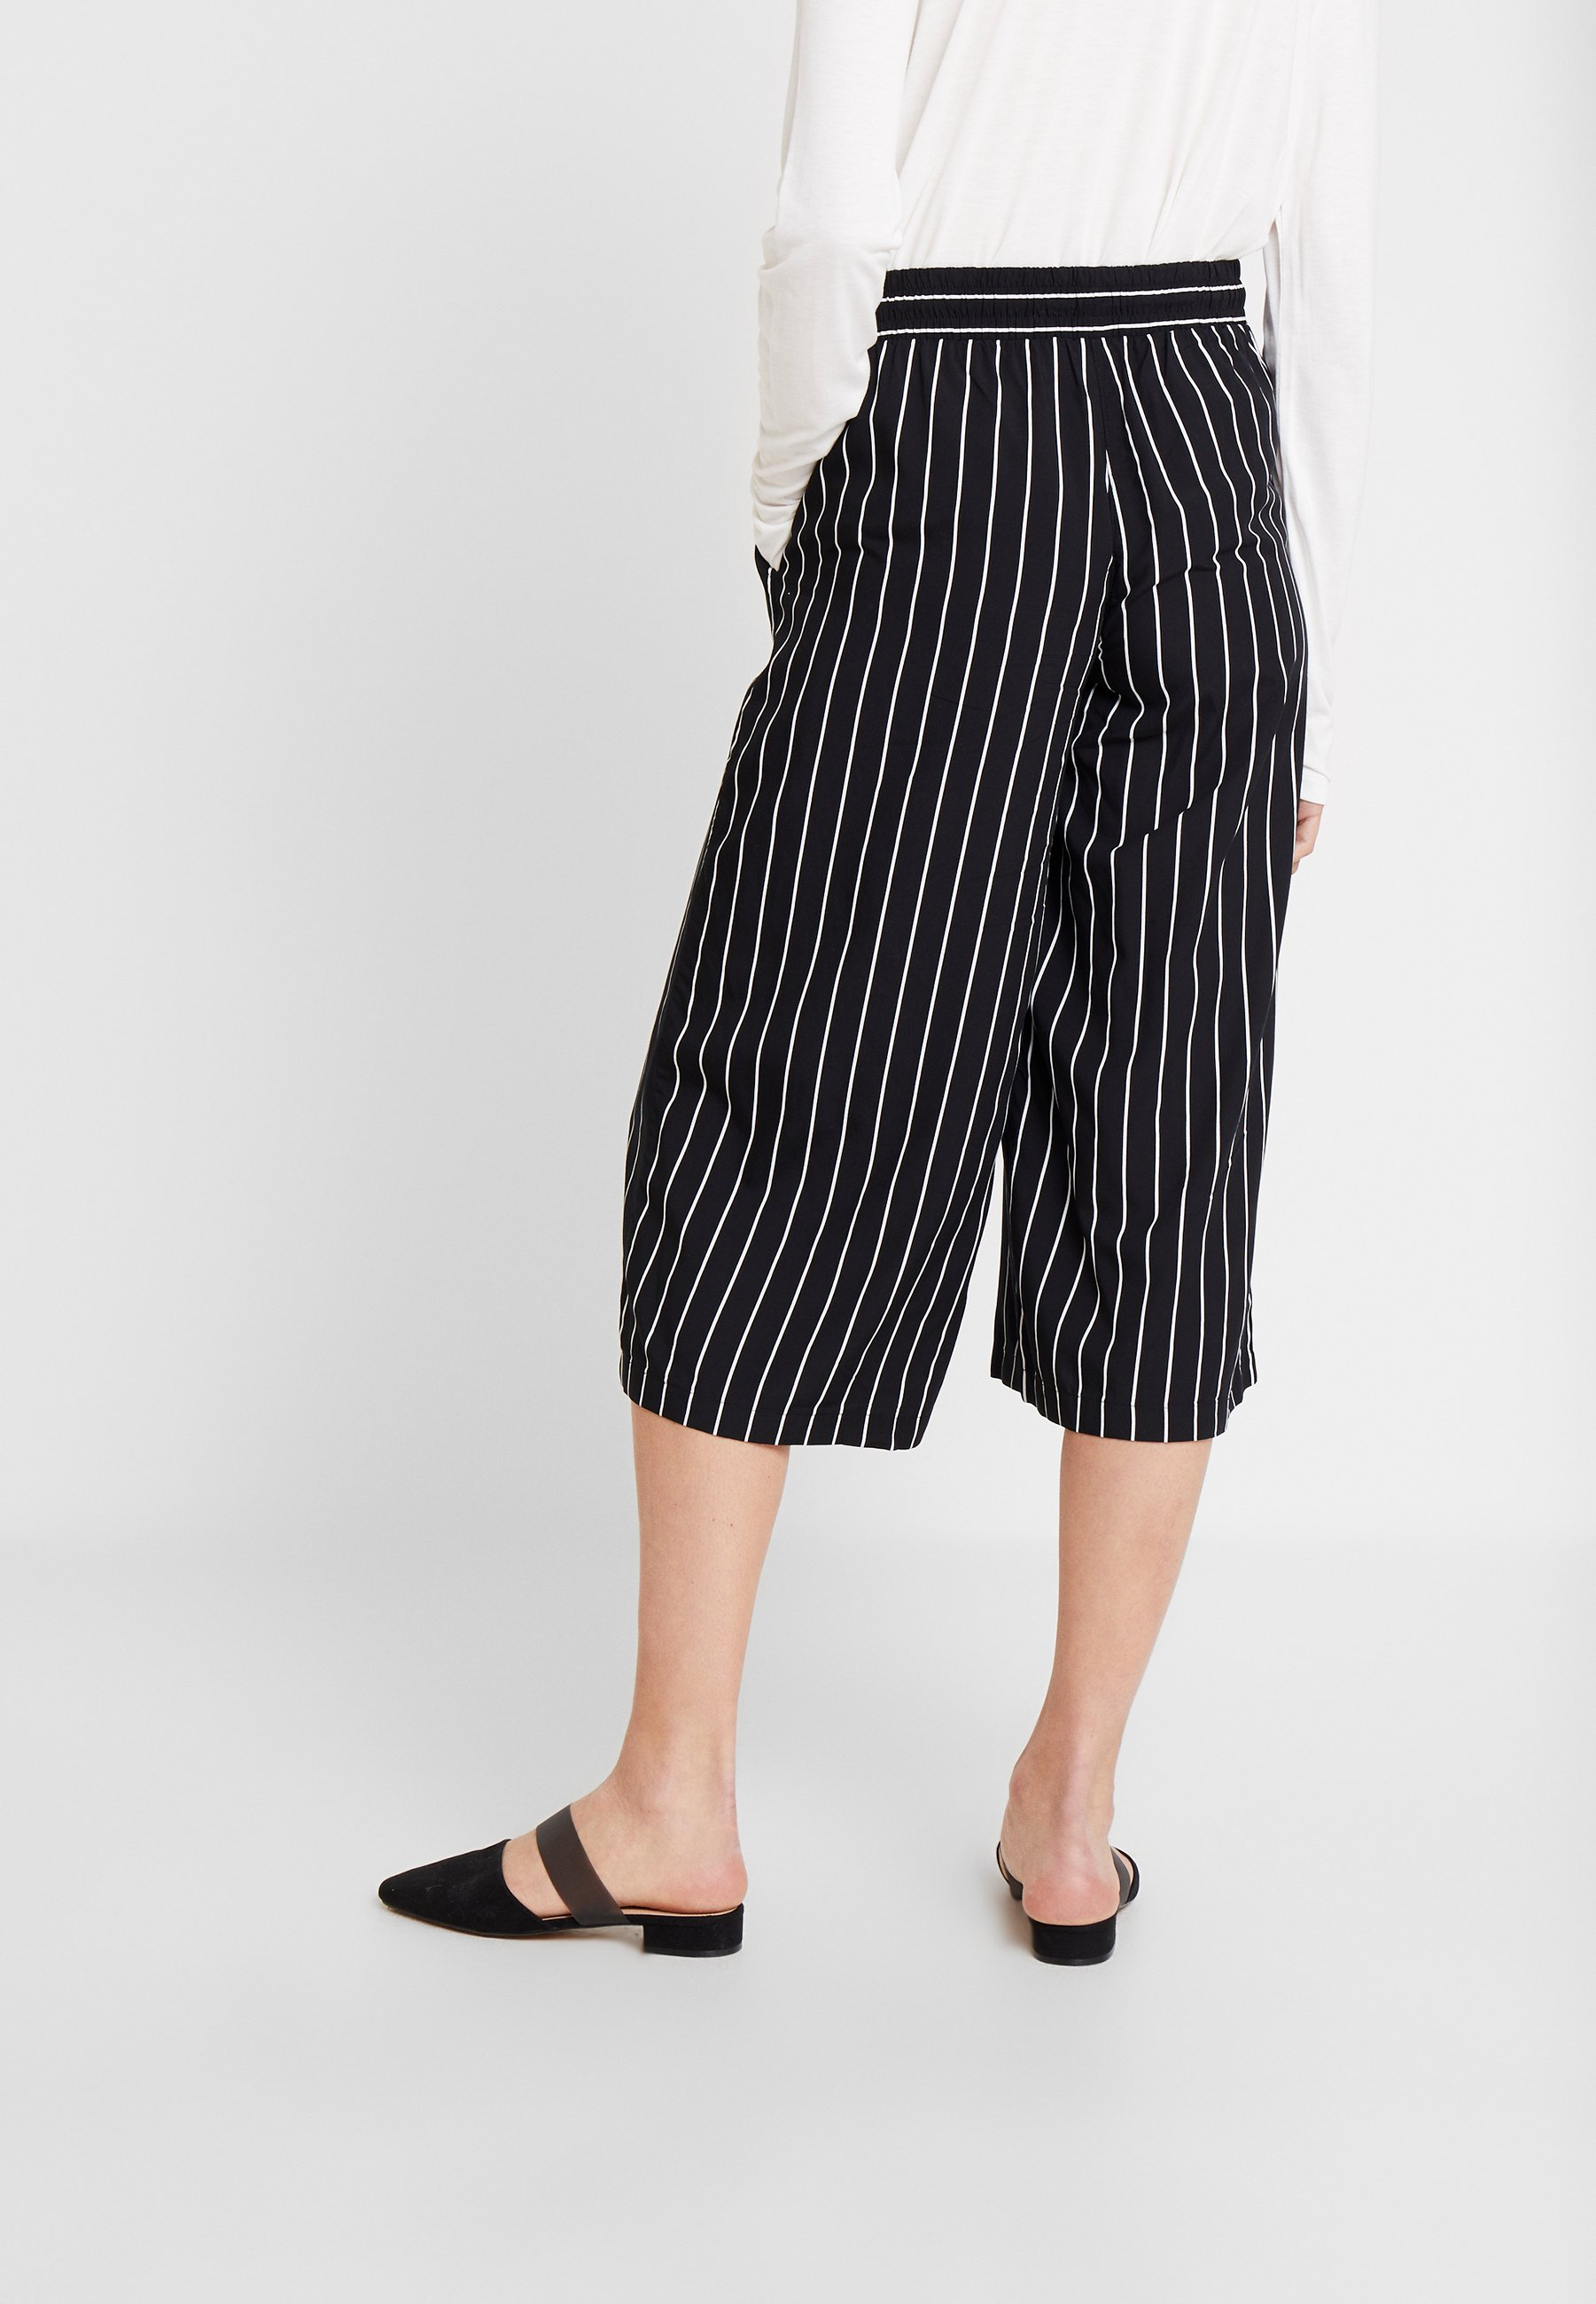 Black Pantalon ClassiqueNinja Q By Designed s SUqzpMV